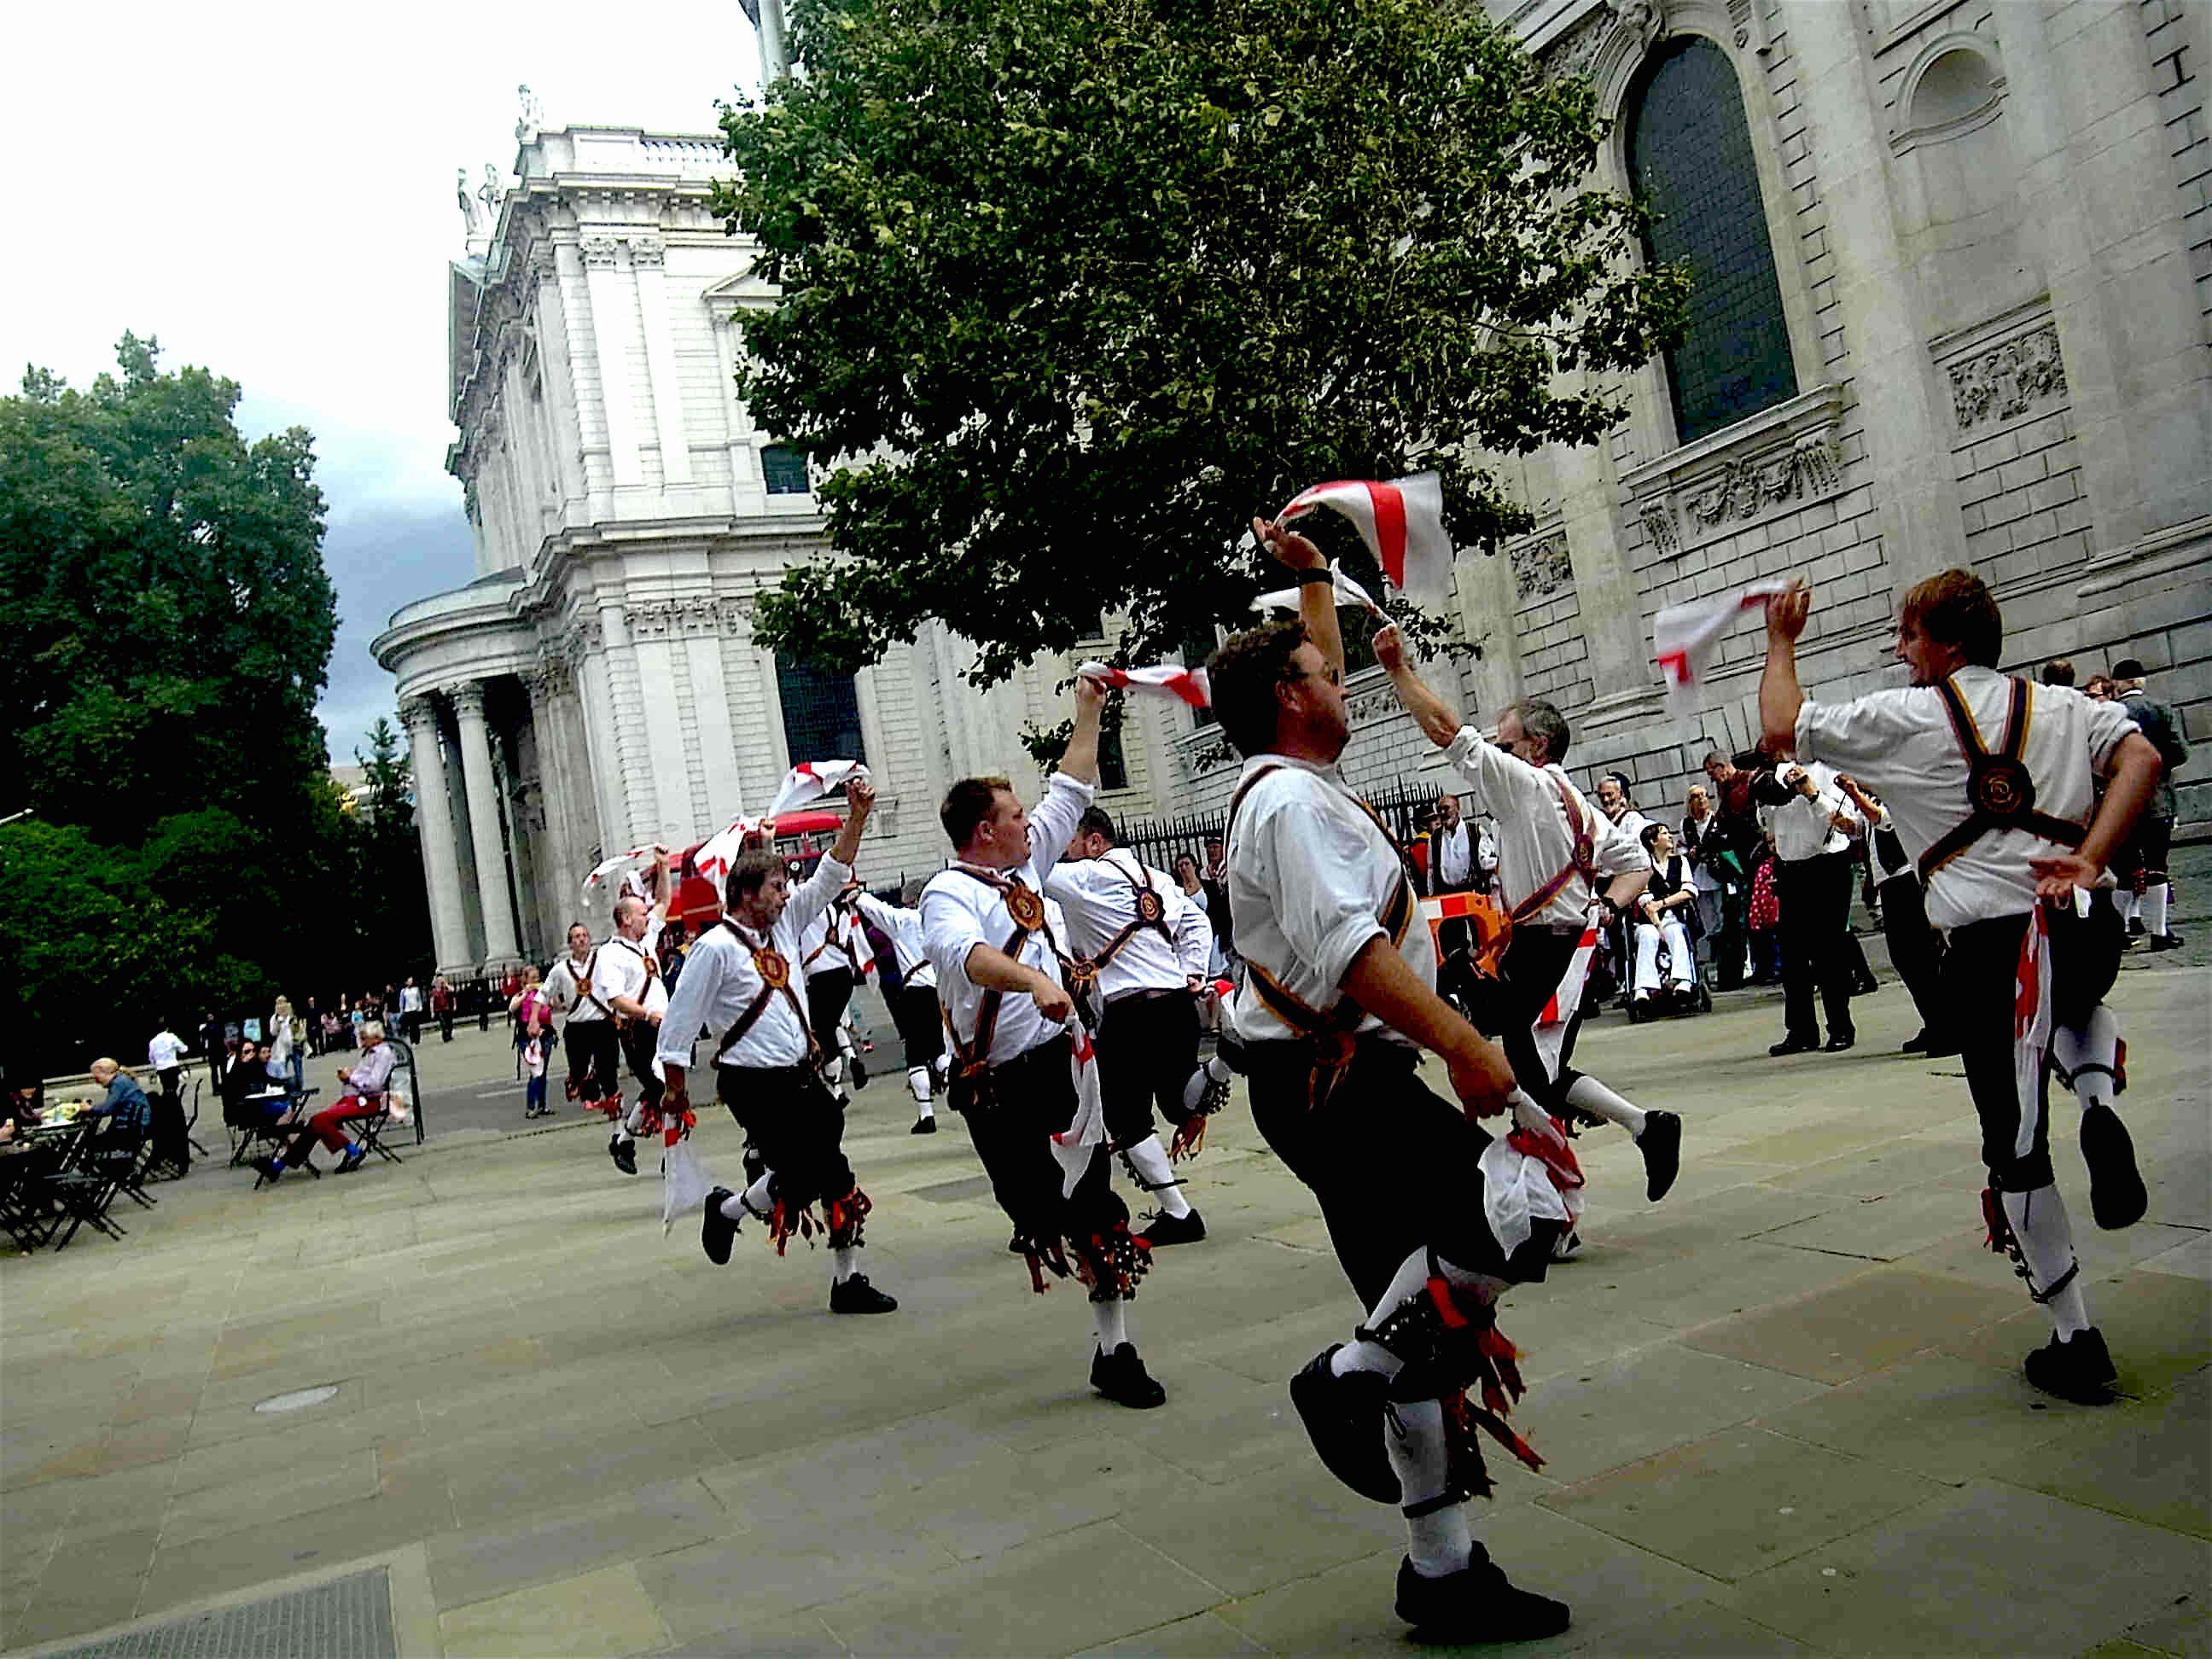 Morris dancing at St Paul's cathedral